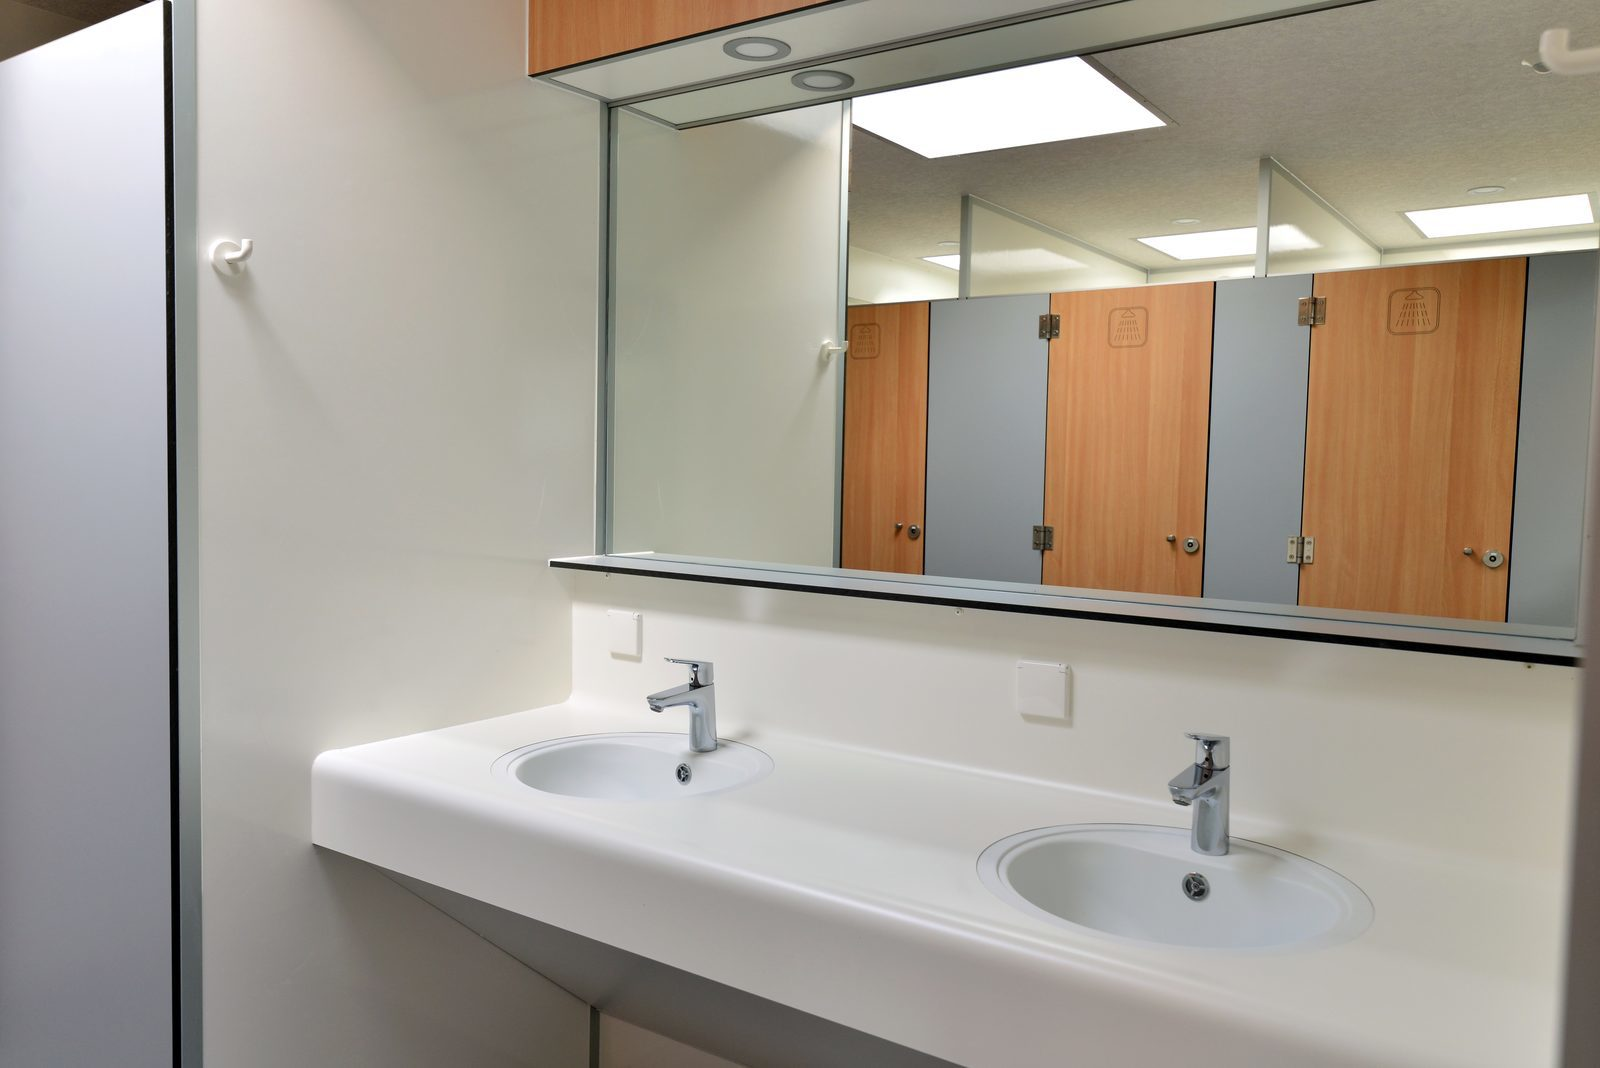 Sinks sanitary